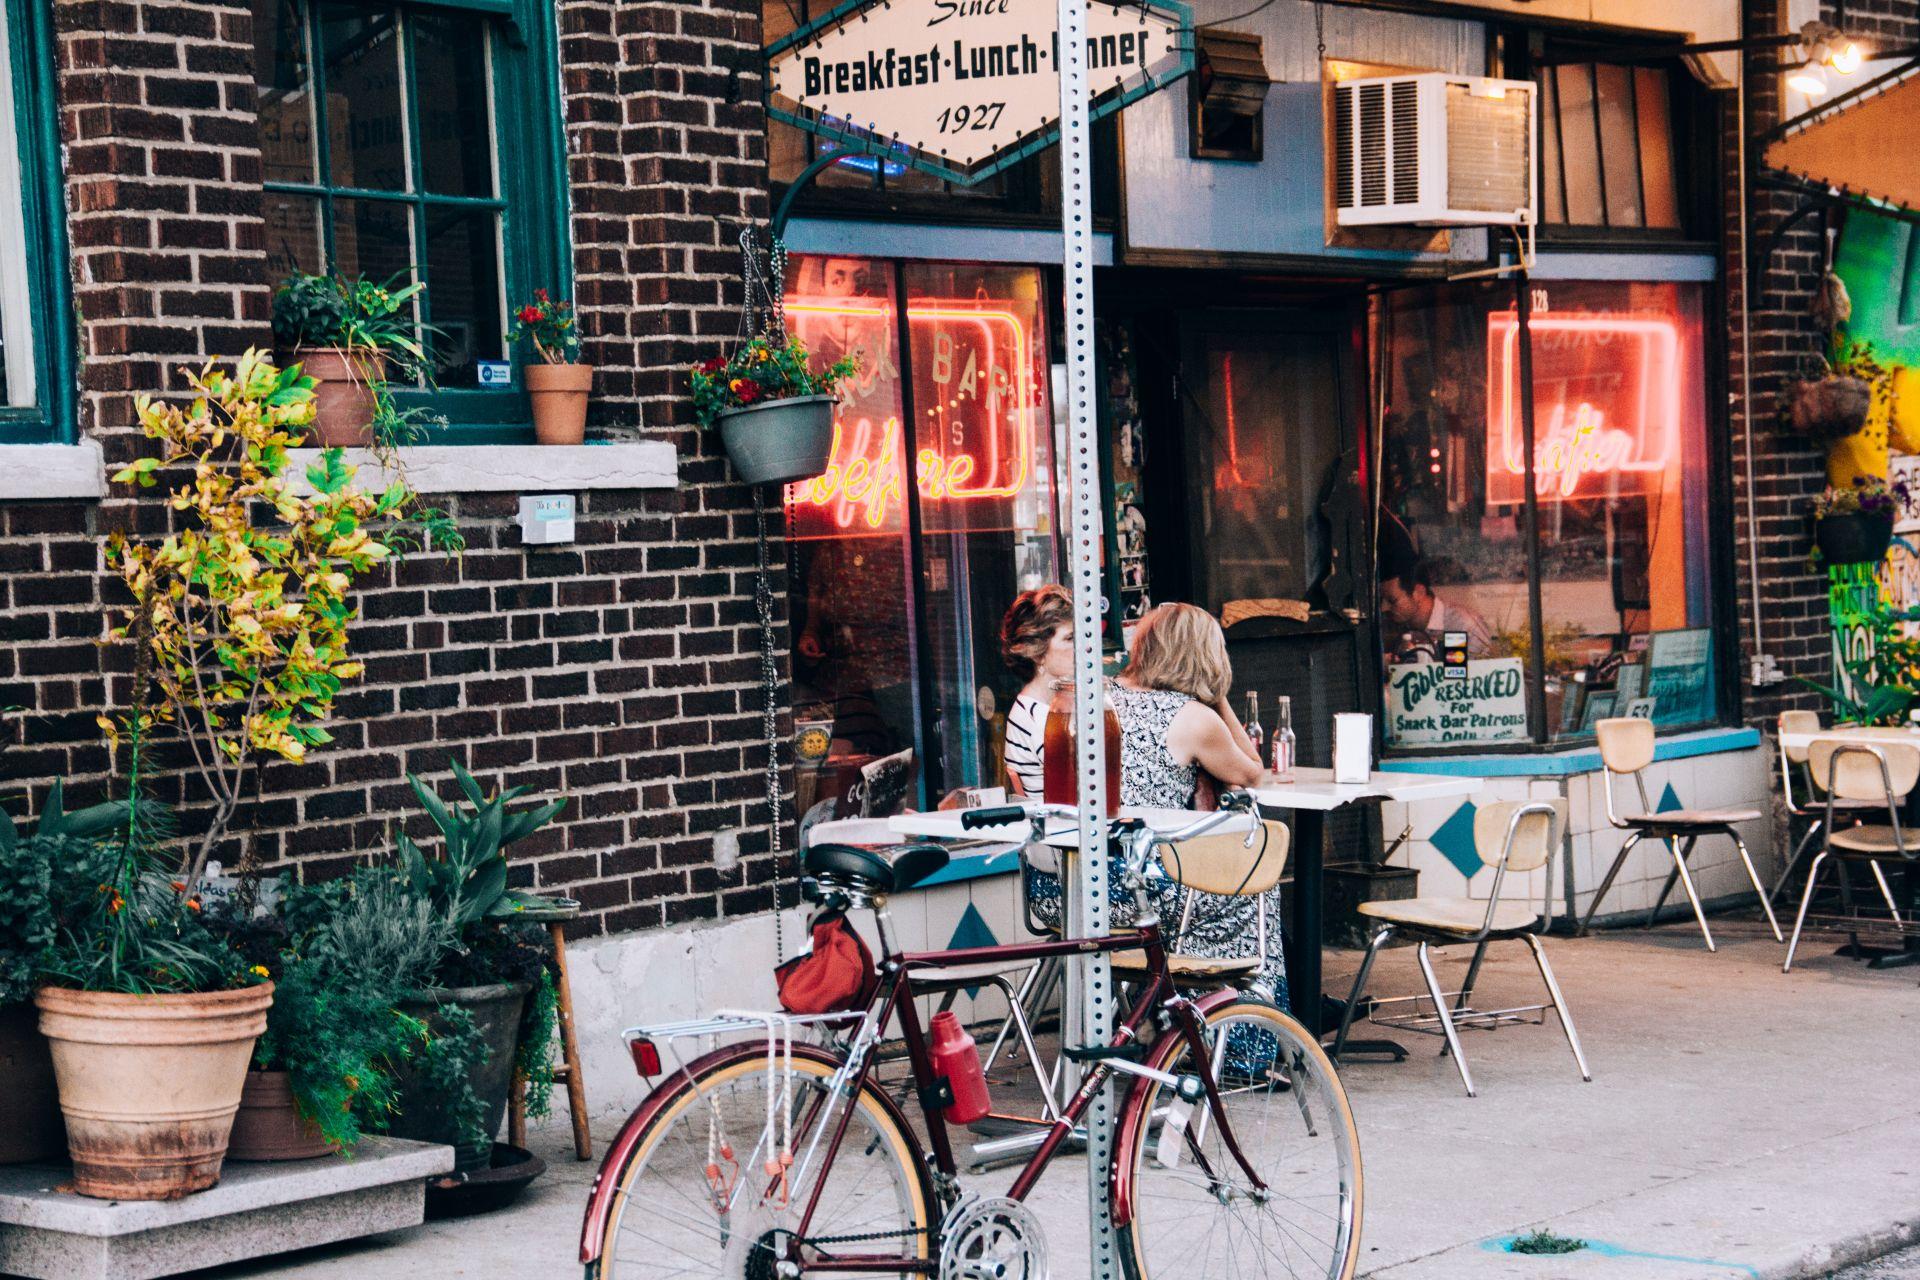 Cafe in Marrickville. Great street corner spot. Low Rent.